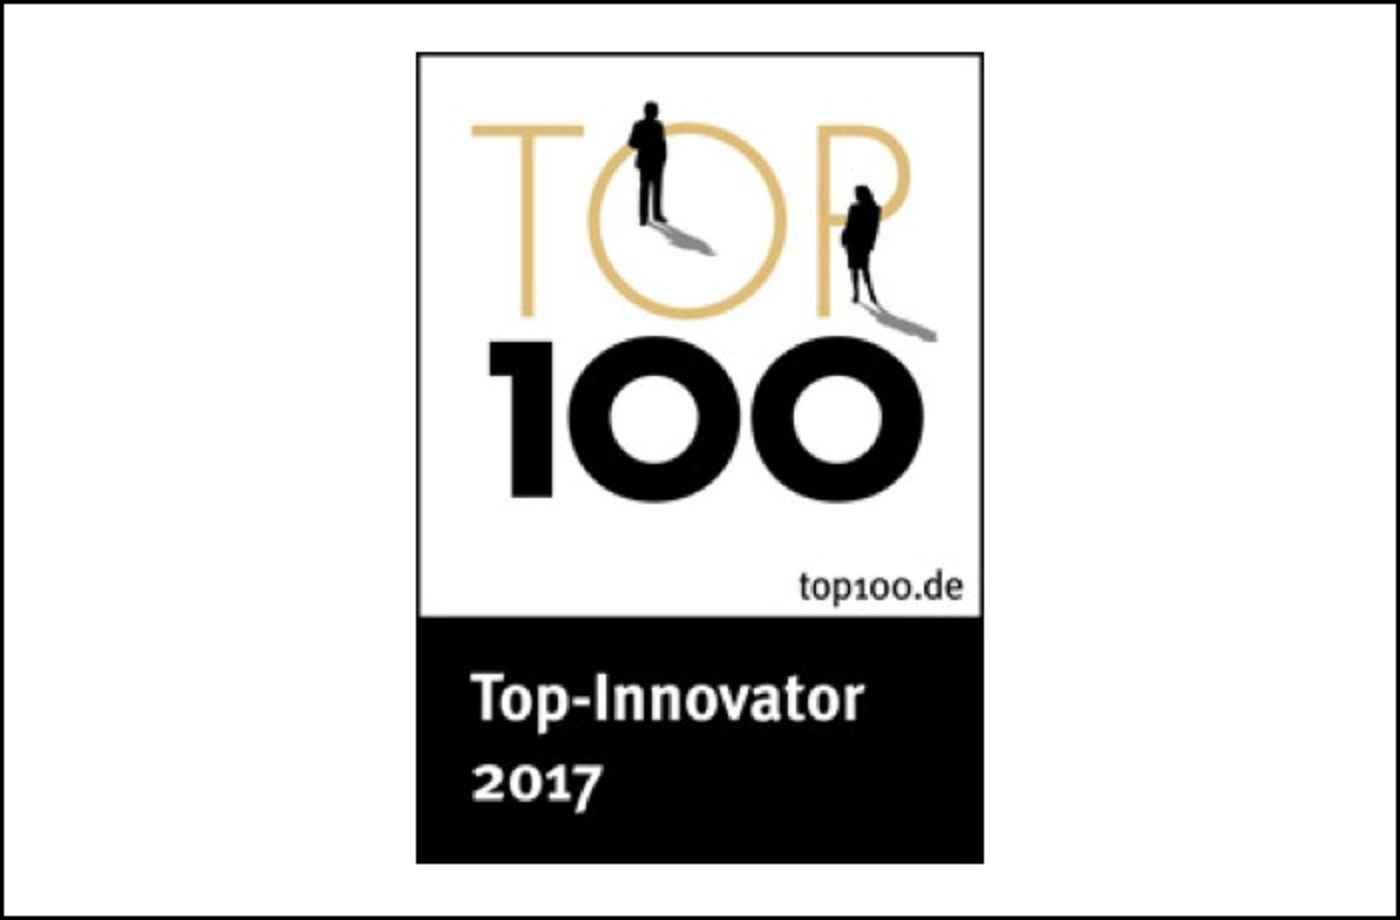 mairec edelmetall precious metal recycling auszeichnung top 100 top innovator 2017 awar